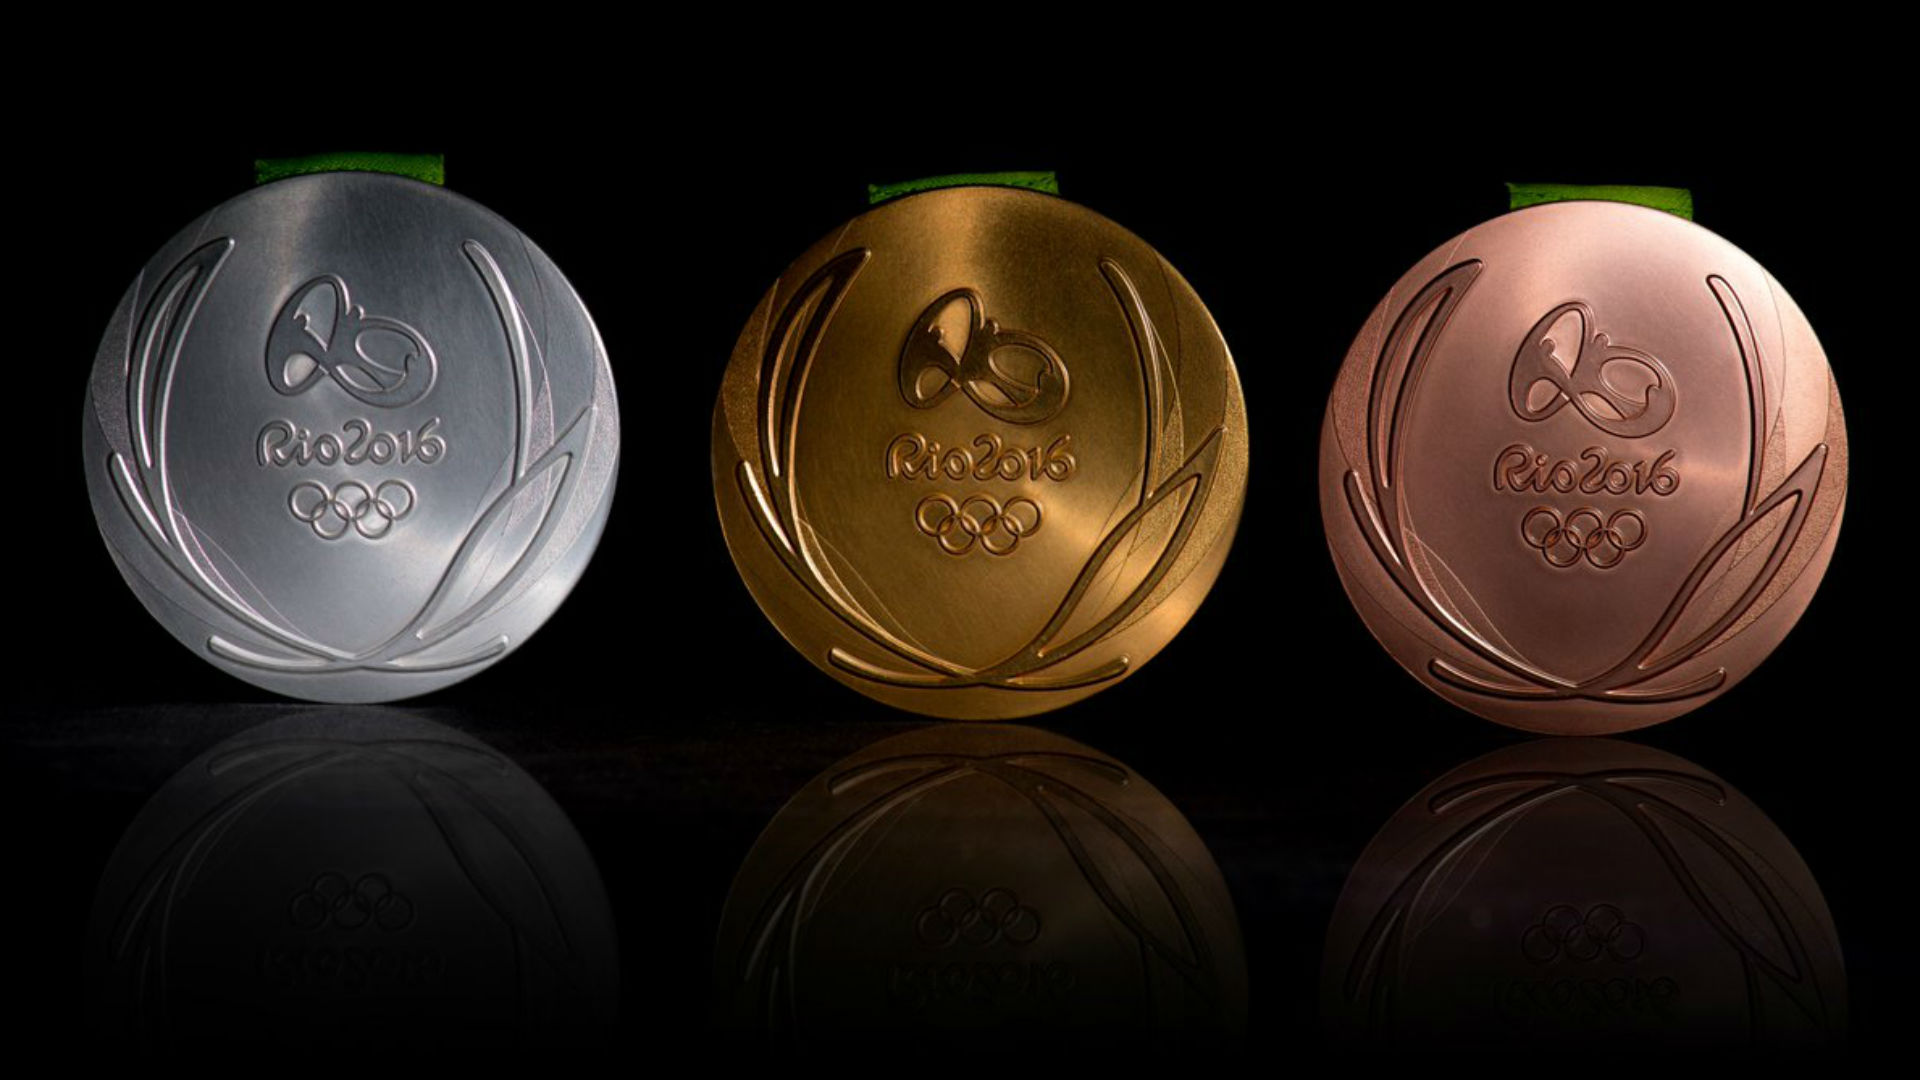 Rio 2016 Olympics medal design unveiled Athletics 1920x1080